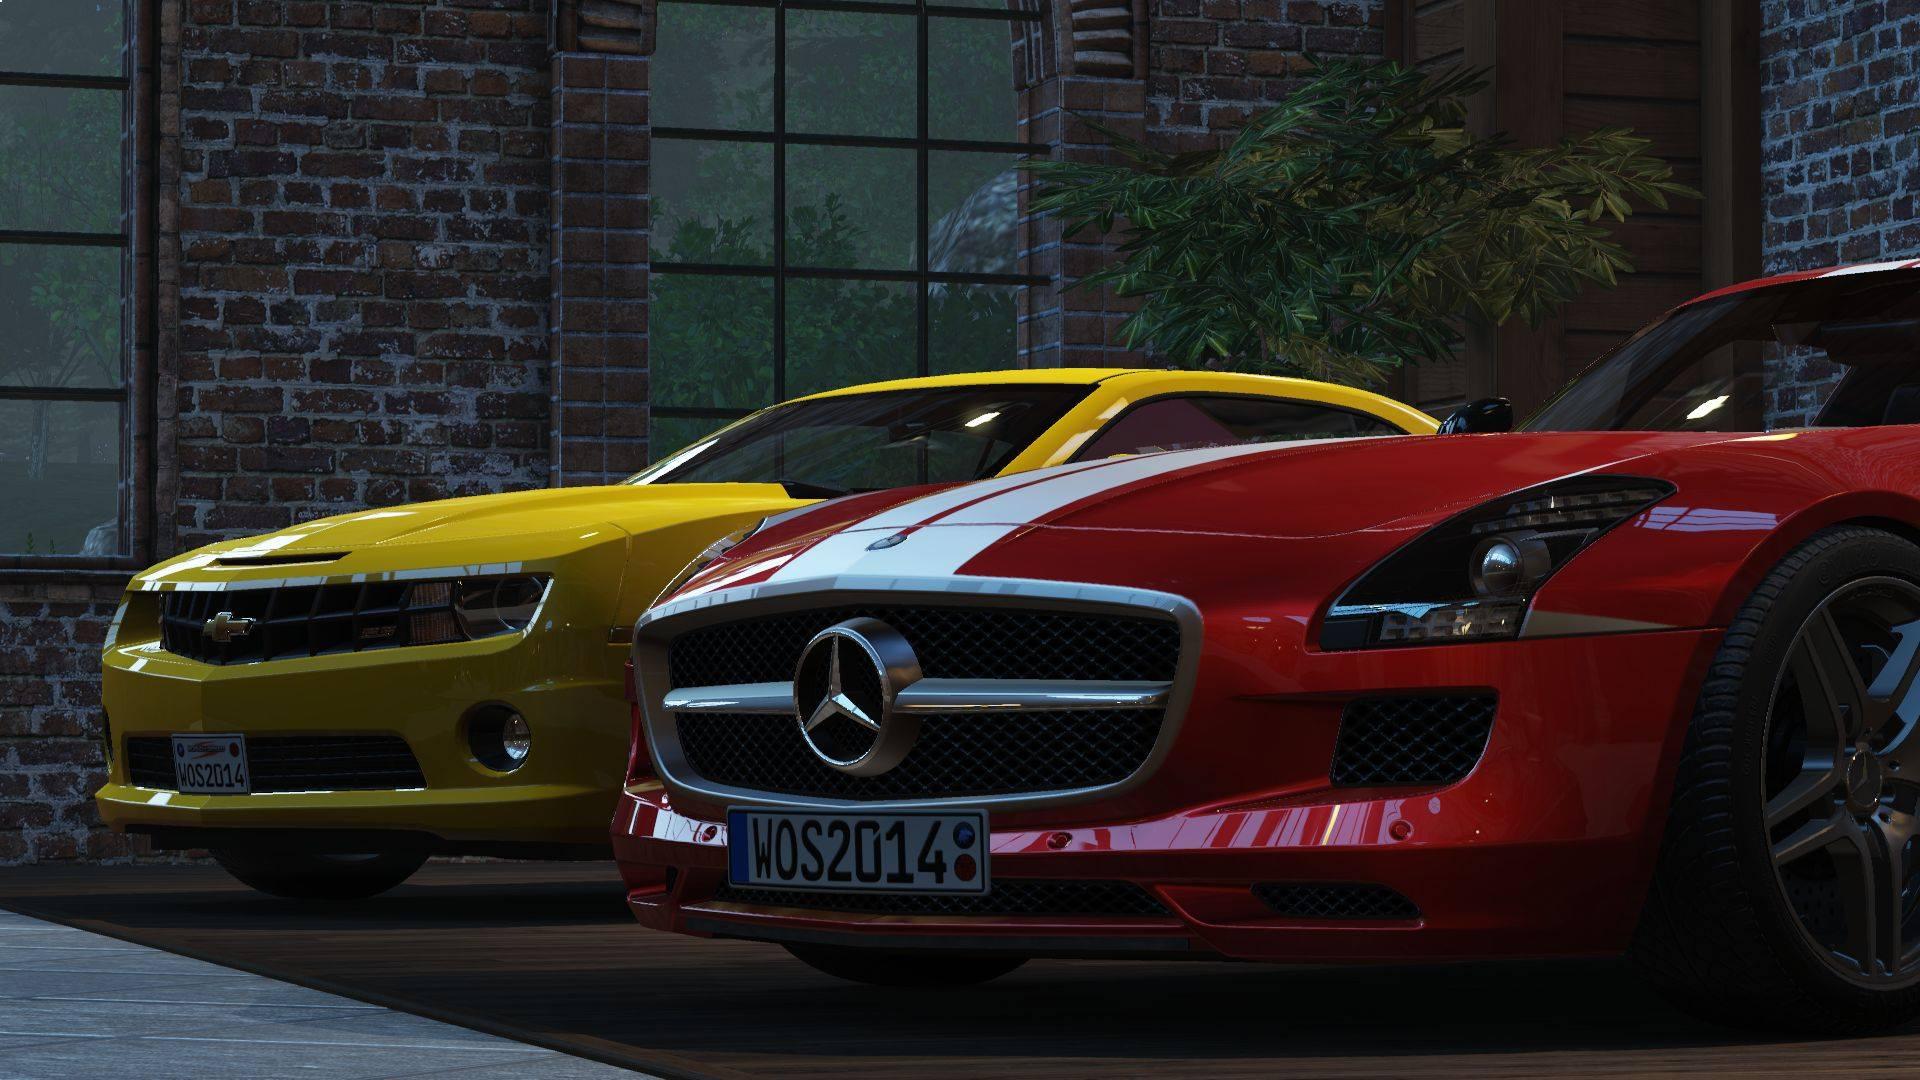 World of Speed - - world of speed, wos